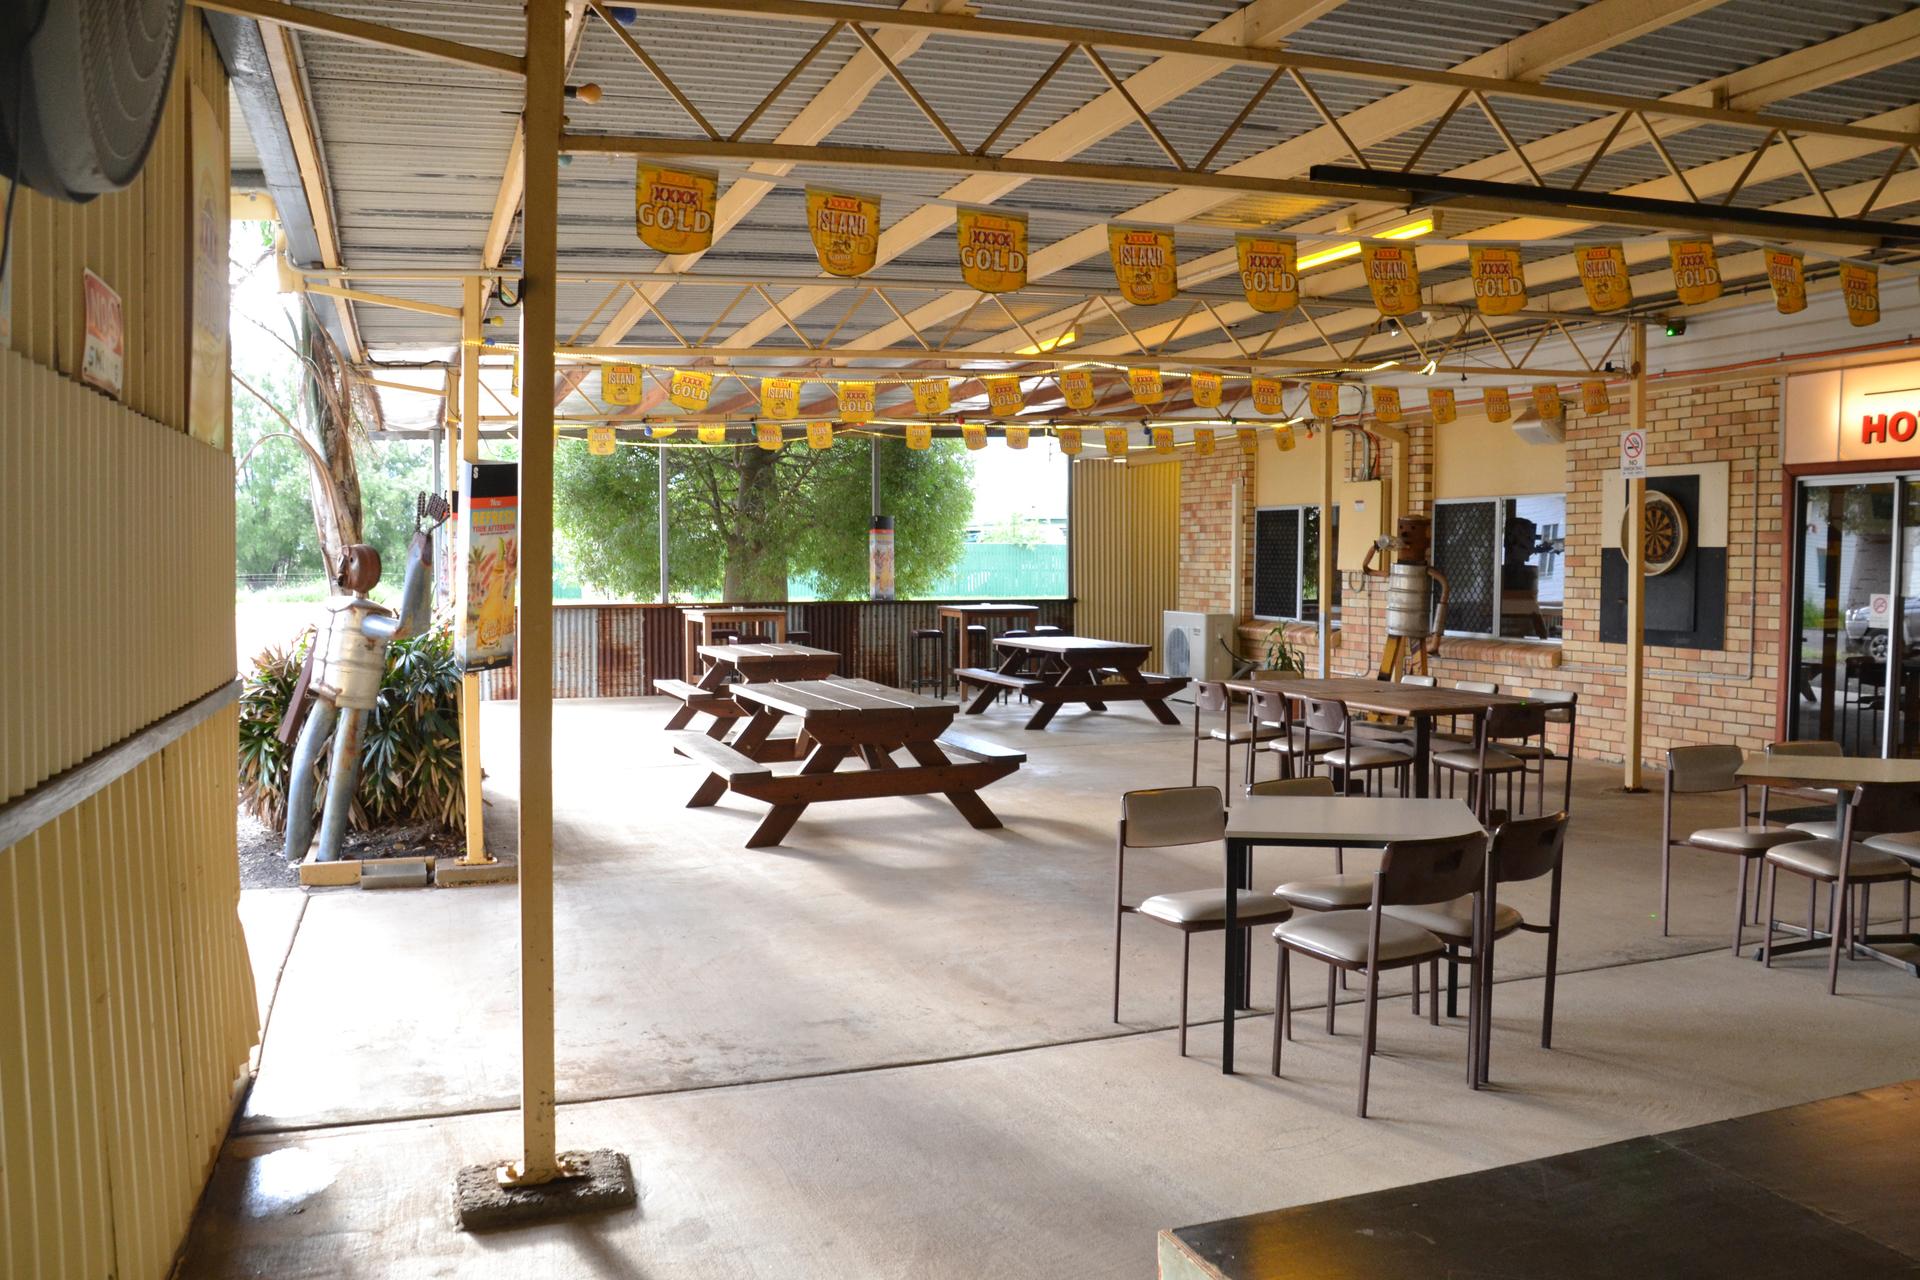 b - Yuleba Hotel Motel and Diner